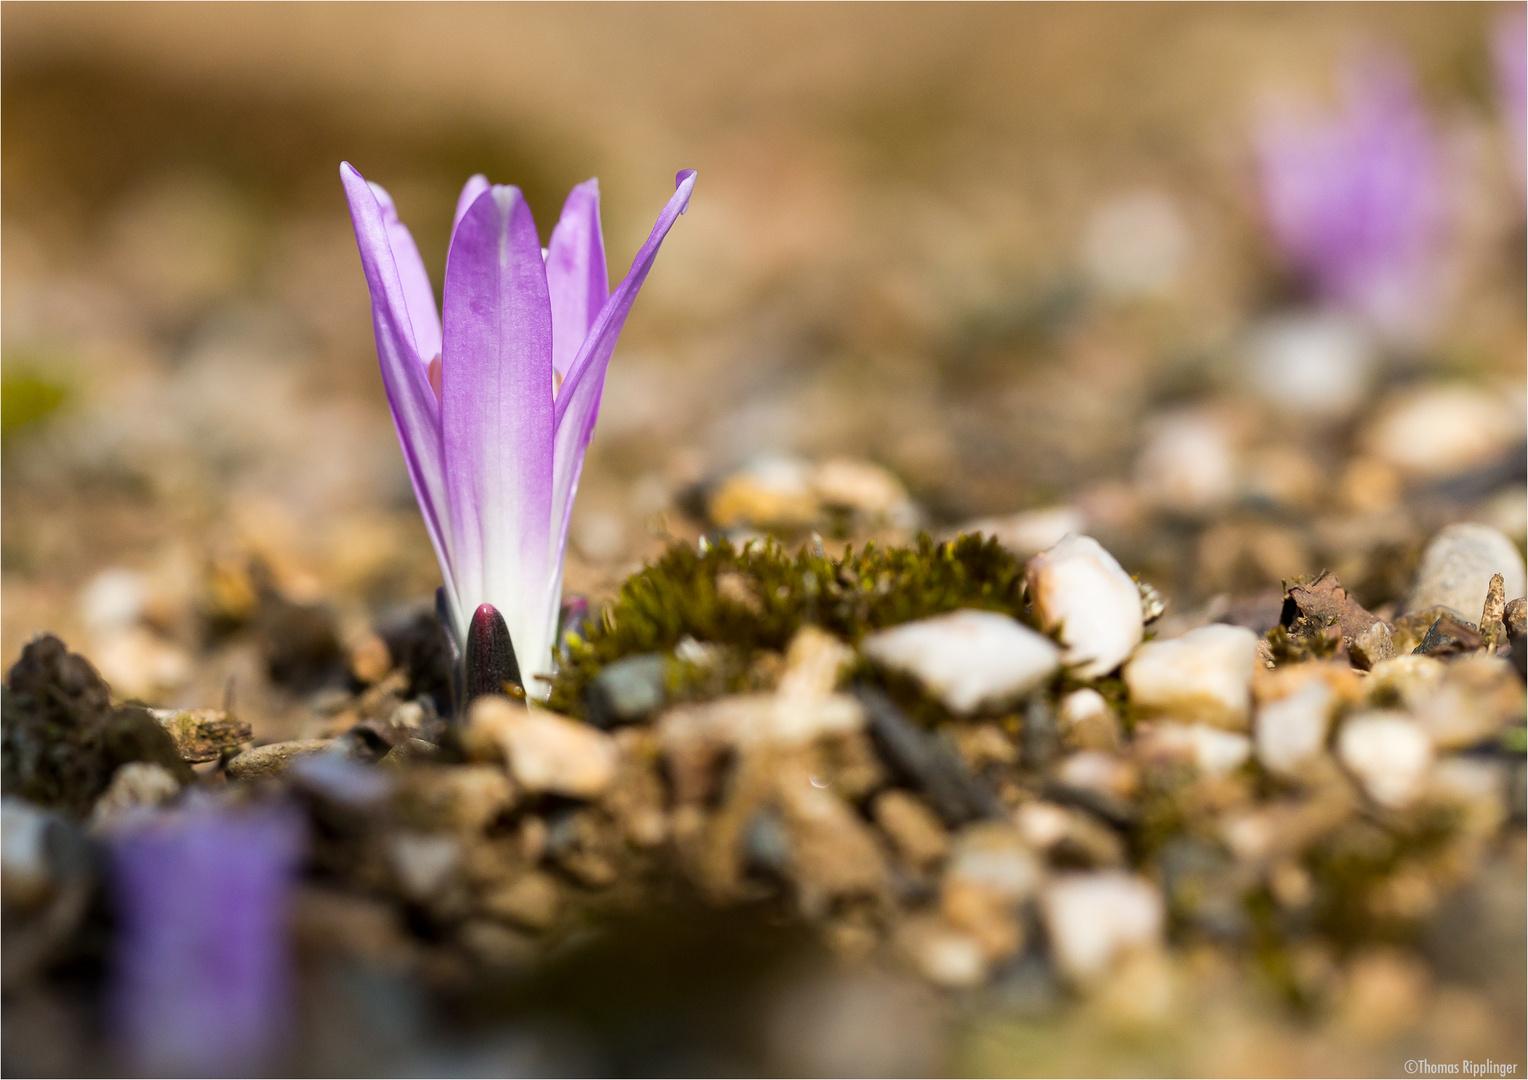 Frühlings Lichtblume (Colchicum bulbocodium)...